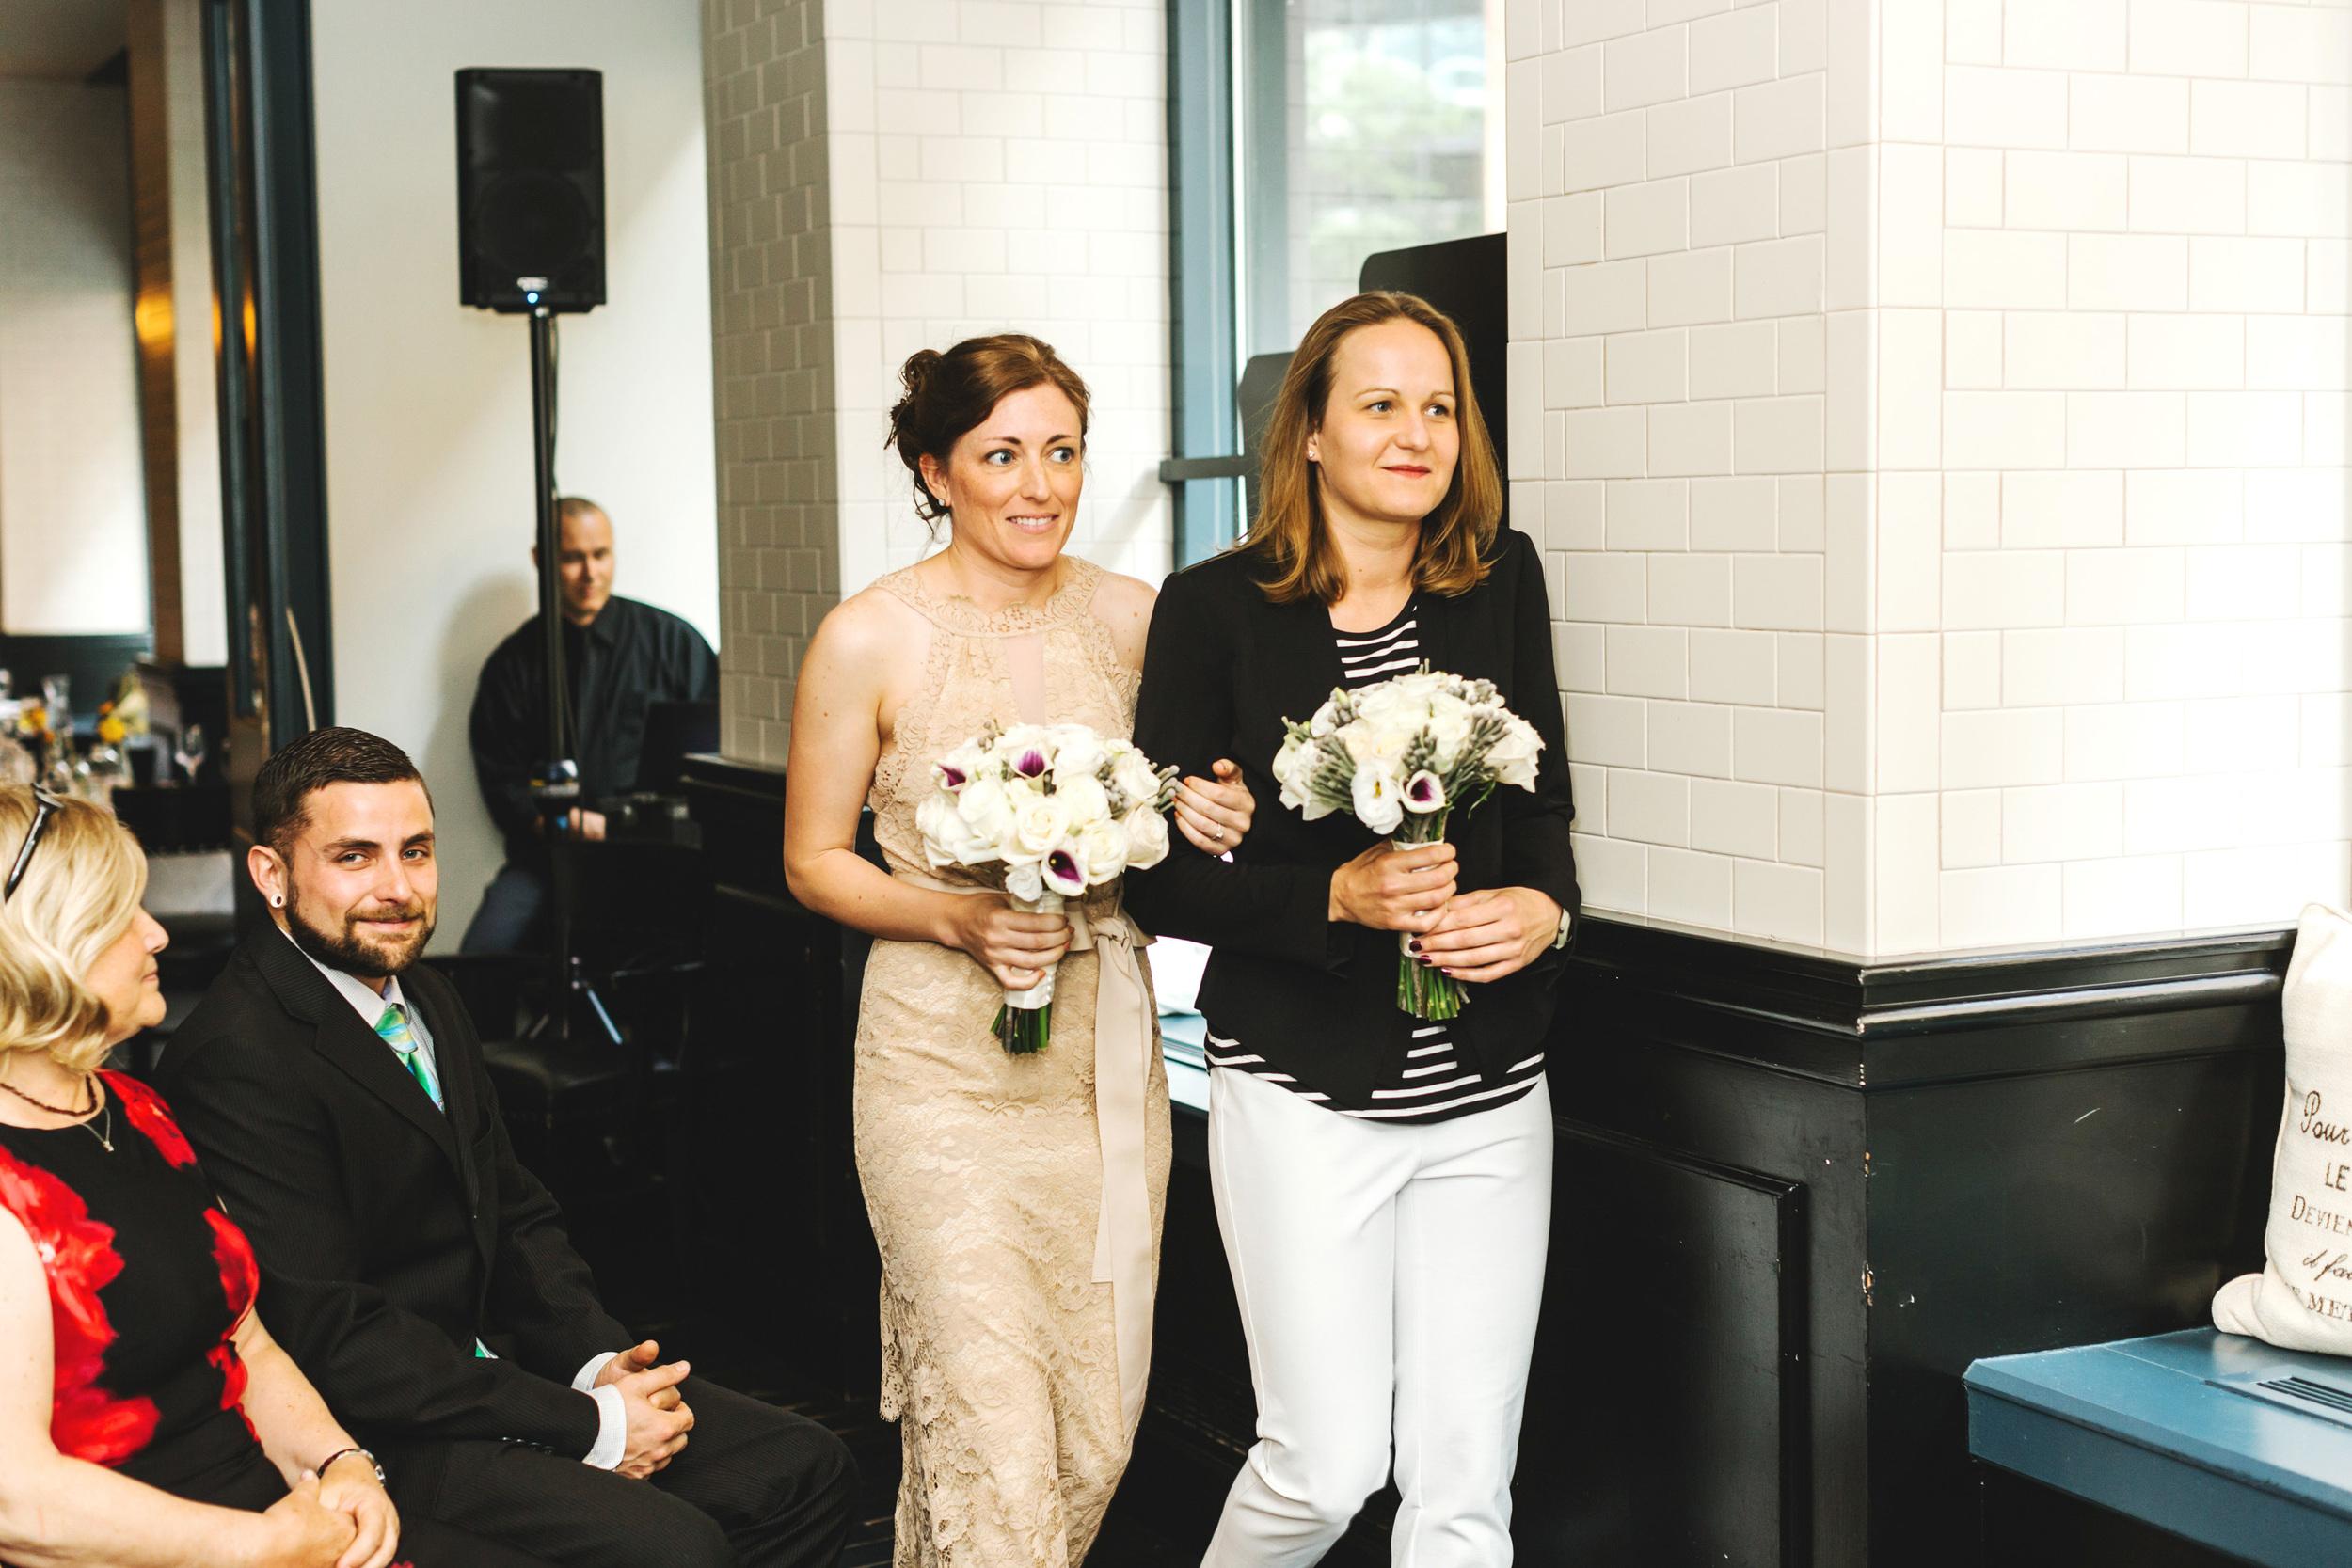 Boston_Wedding_Photographer_Lena_Mirisola-49.jpg